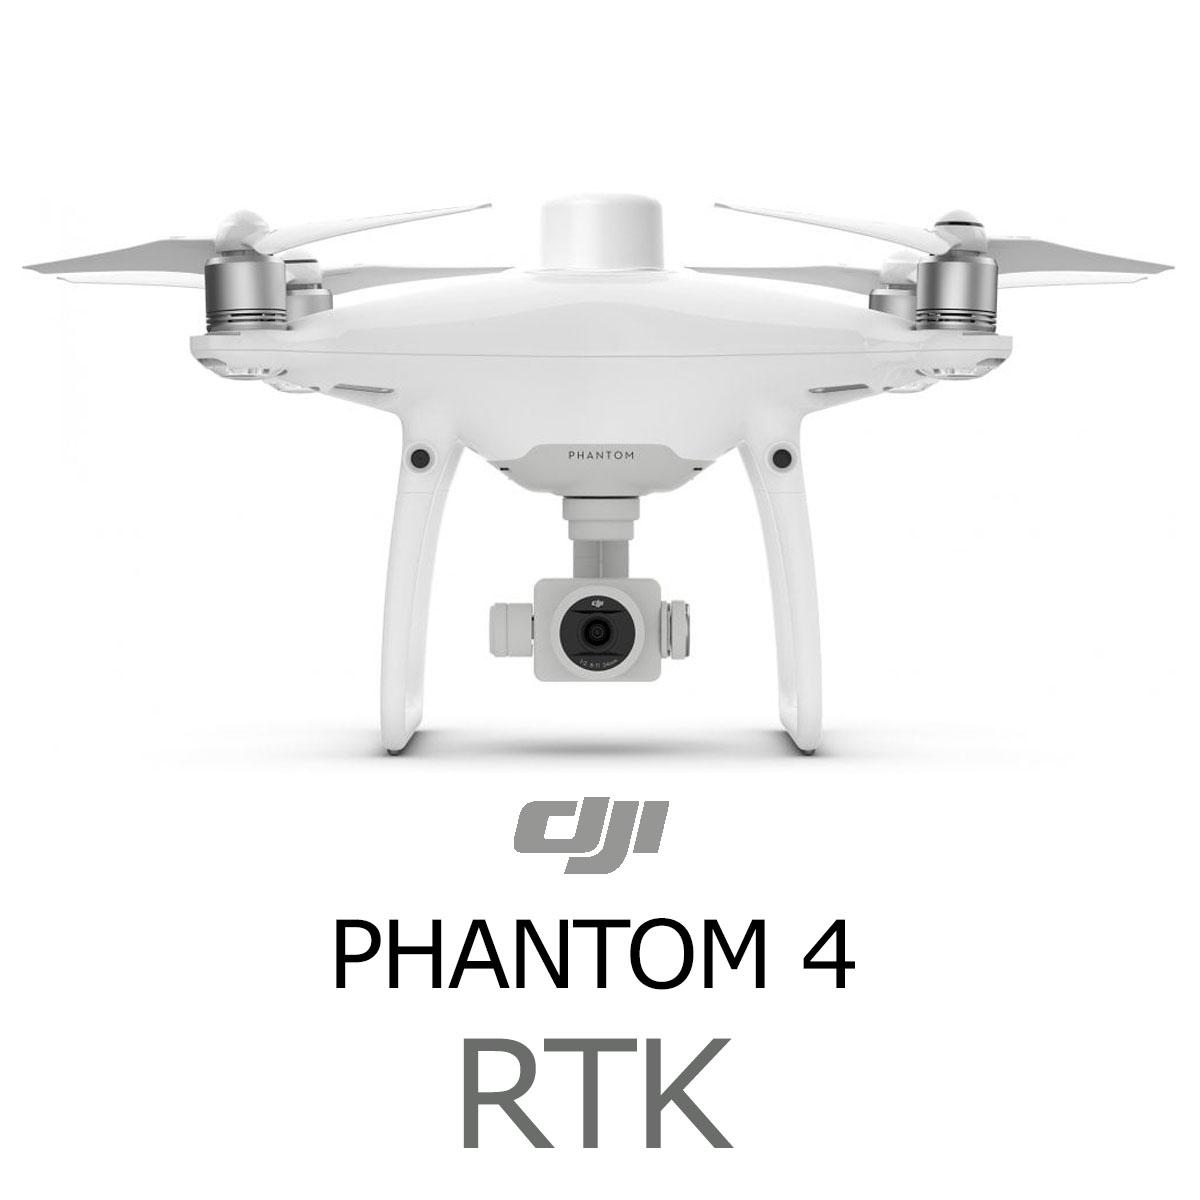 DJI Phantom 4 RTK